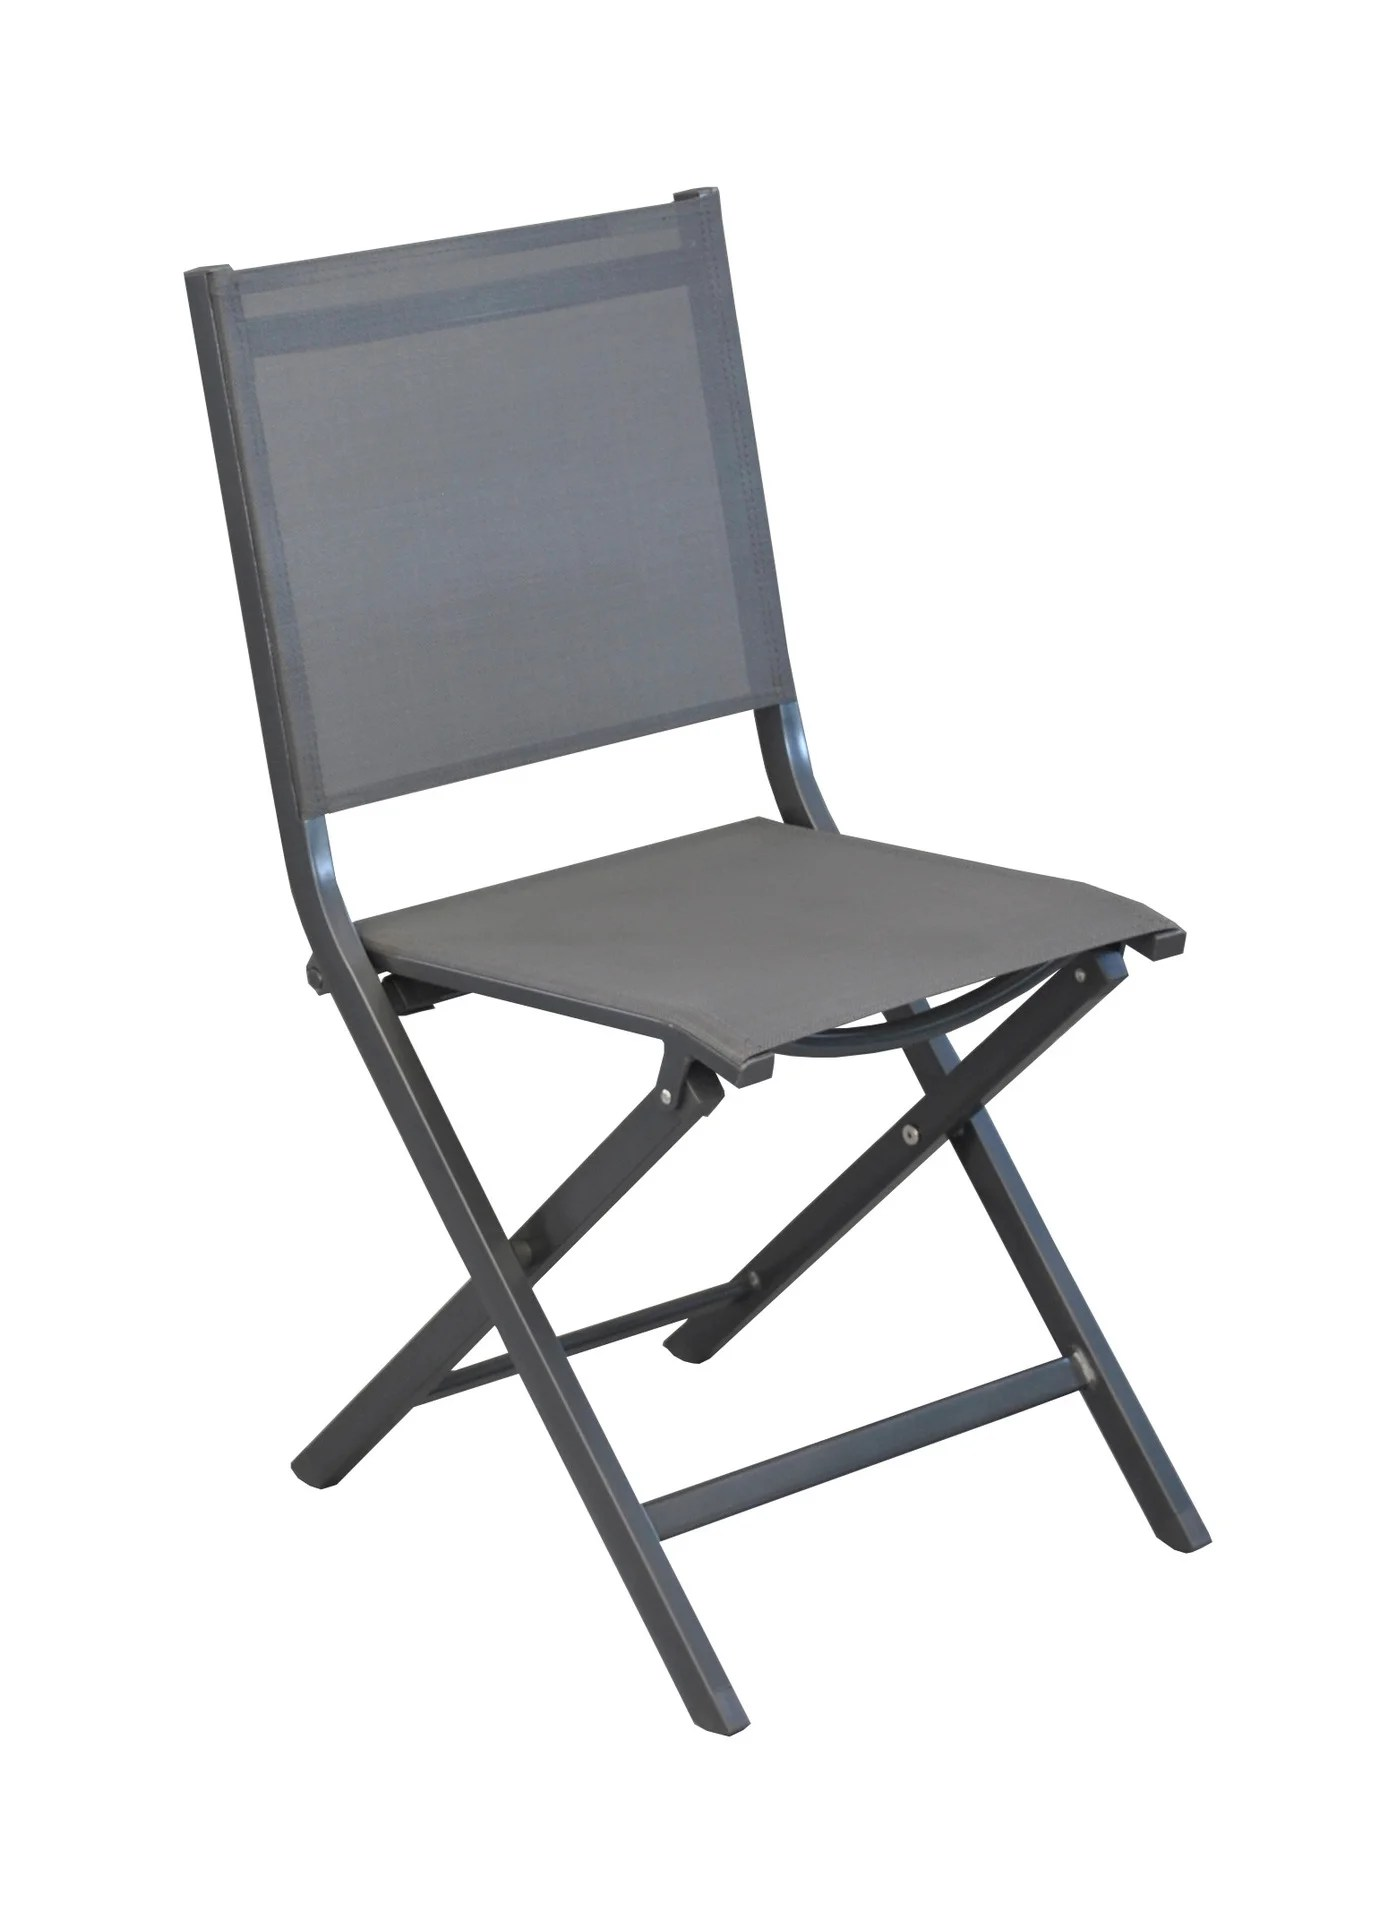 chaise de jardin aluminium gris leroy